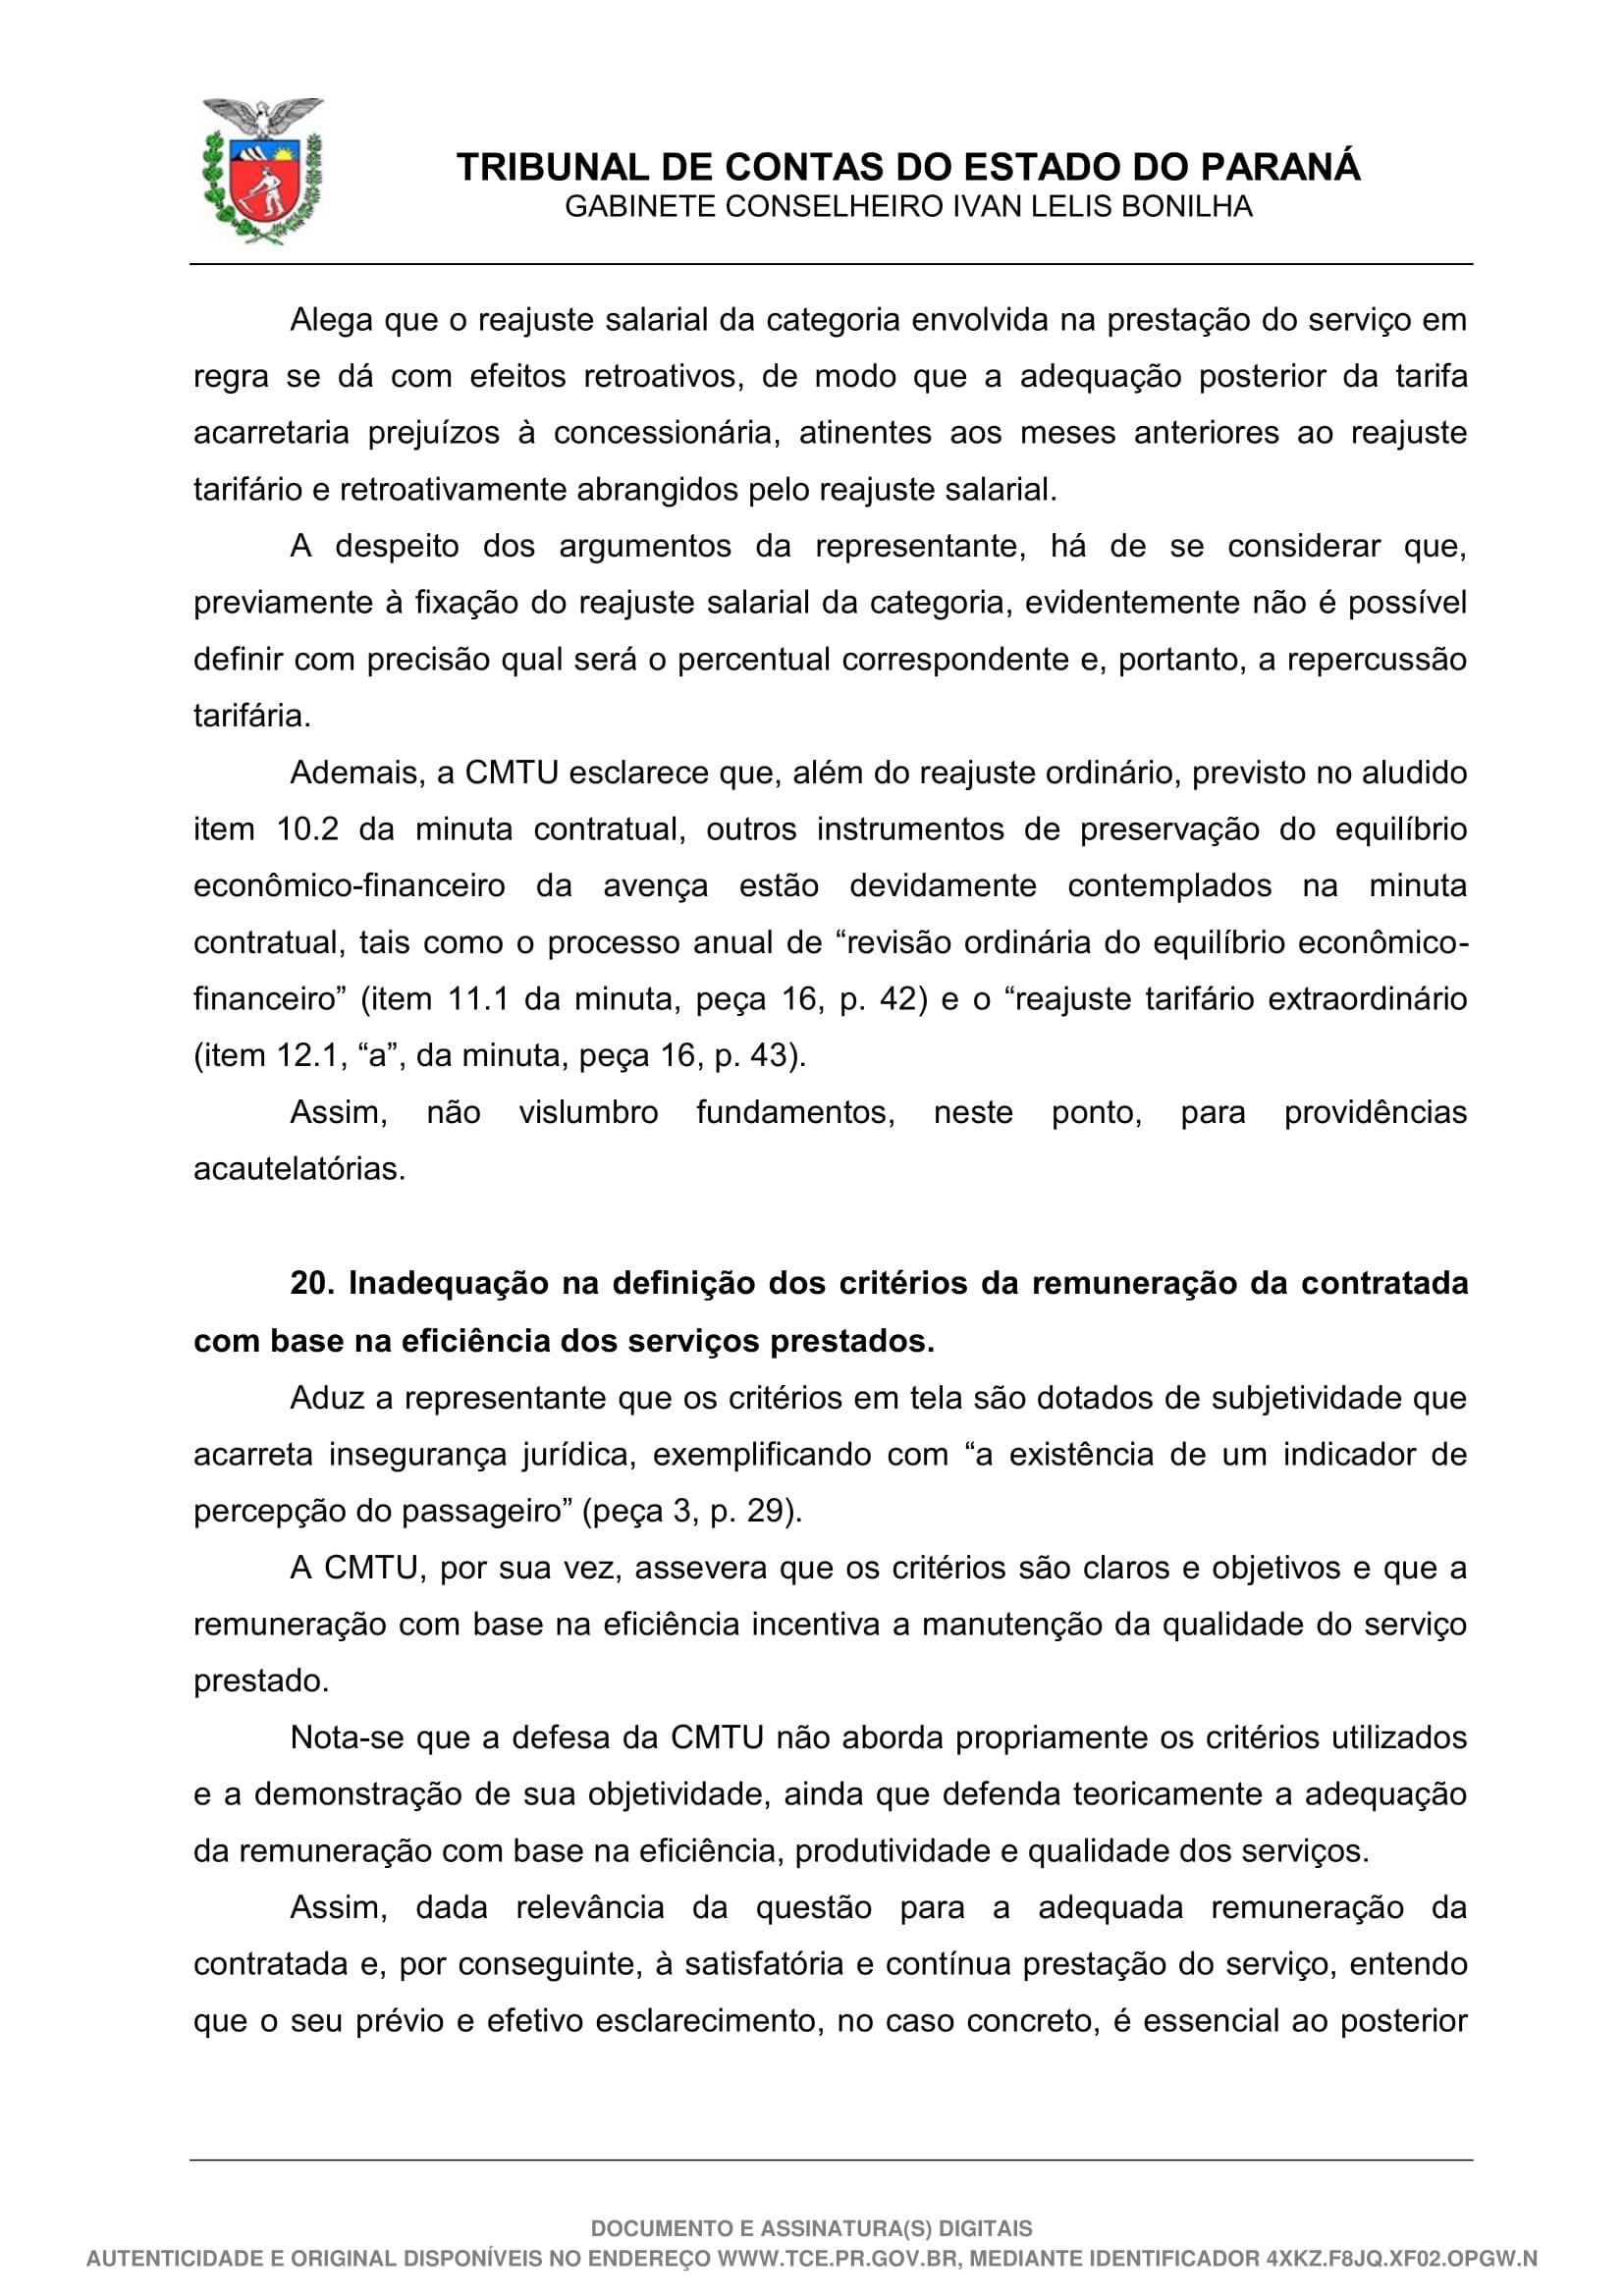 Despacho - 49-19 - GCILB-18